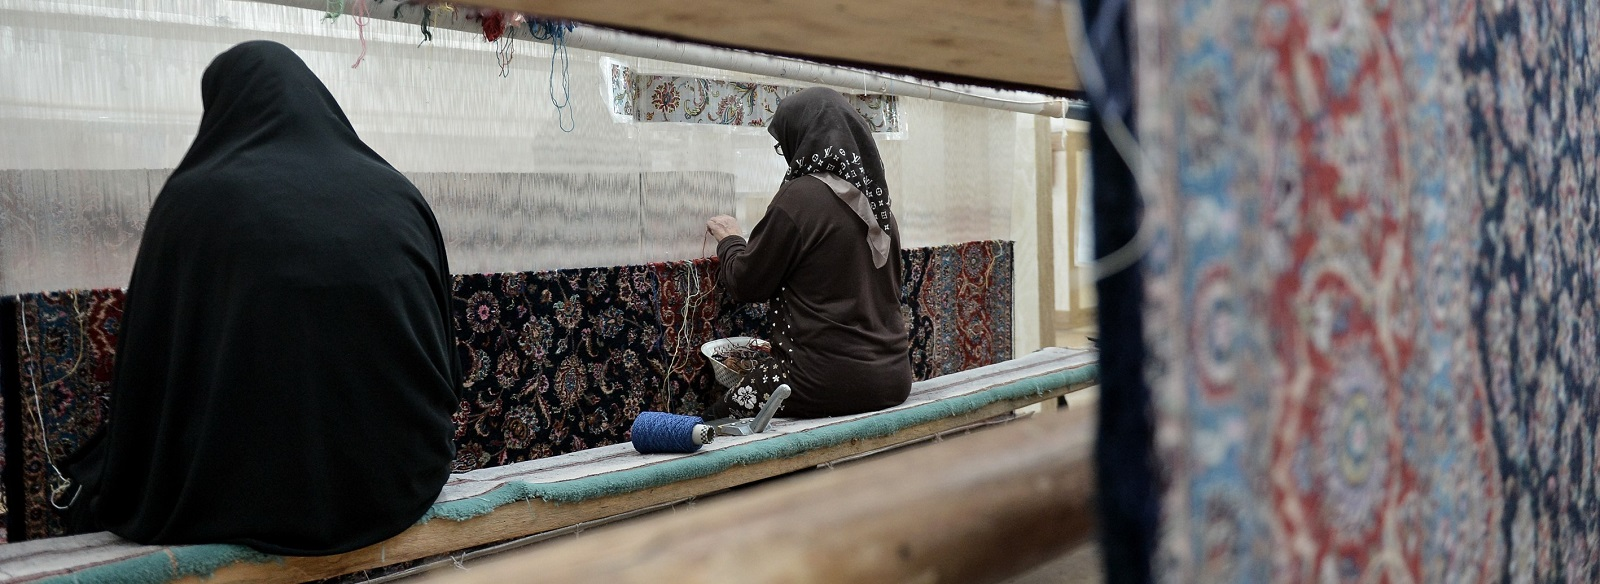 Photo by Fatemeh Bahrami/Anadolu Agency/Getty Images